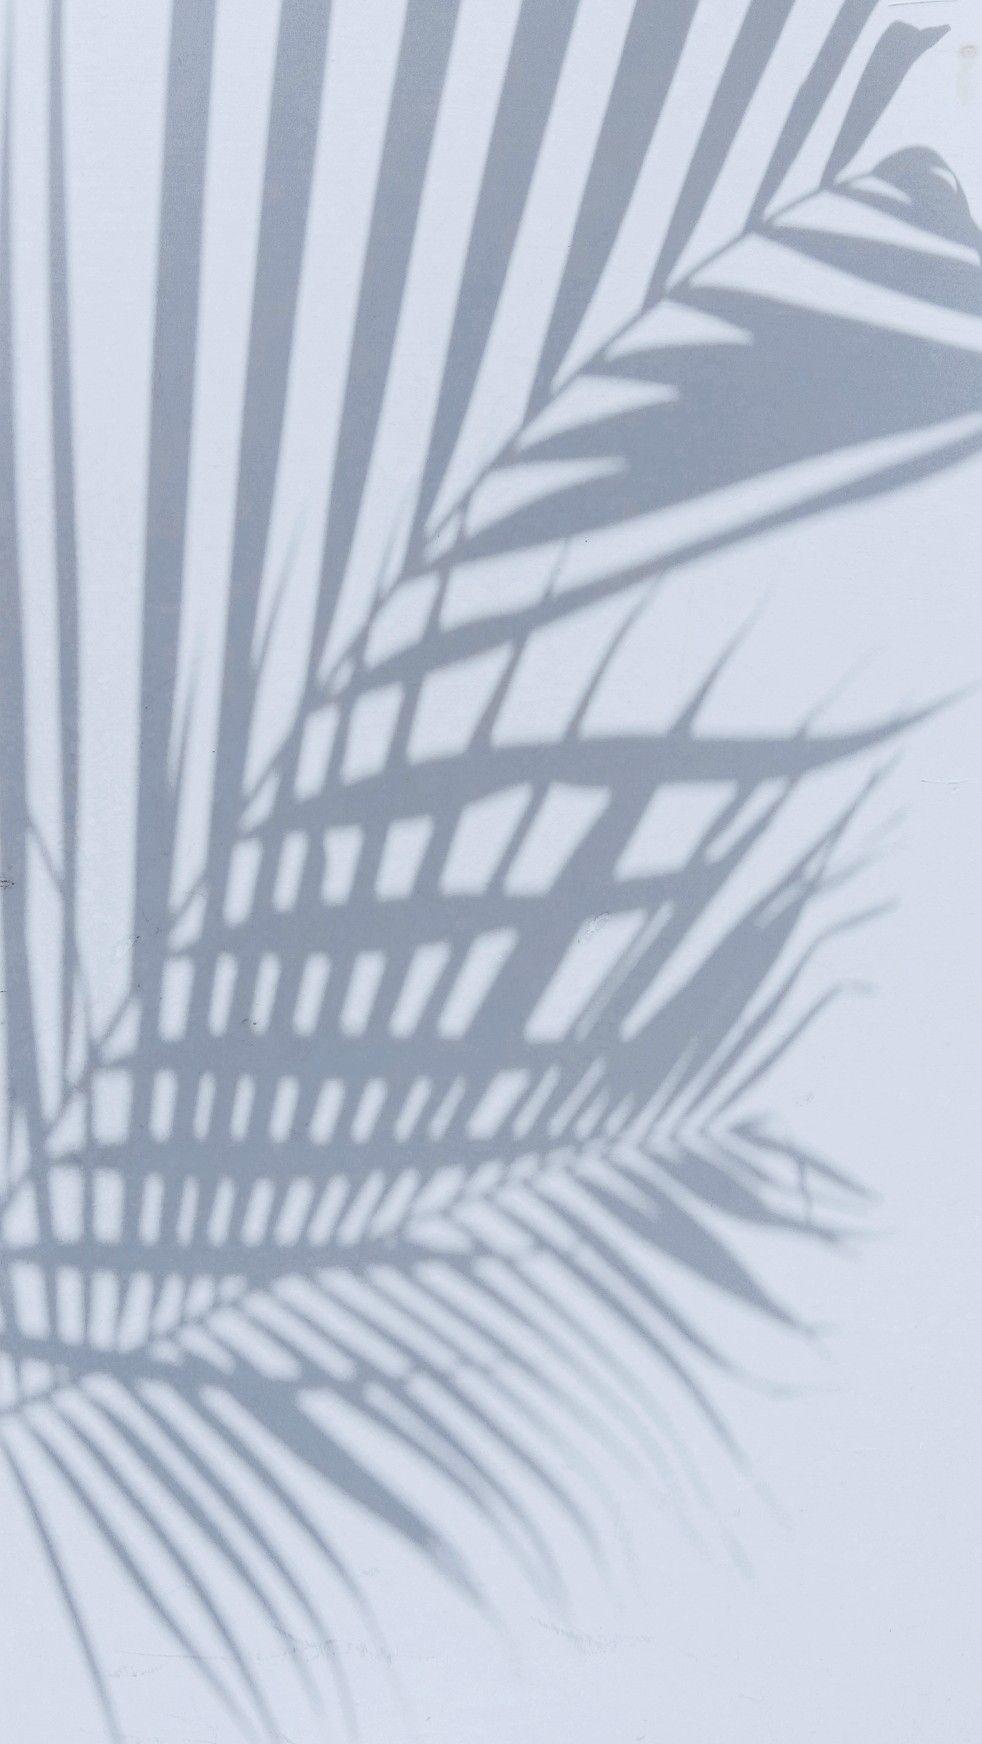 Pin Oleh Florencia Di Jepret By Me Latar Belakang Kertas Dinding Dinding Gambar